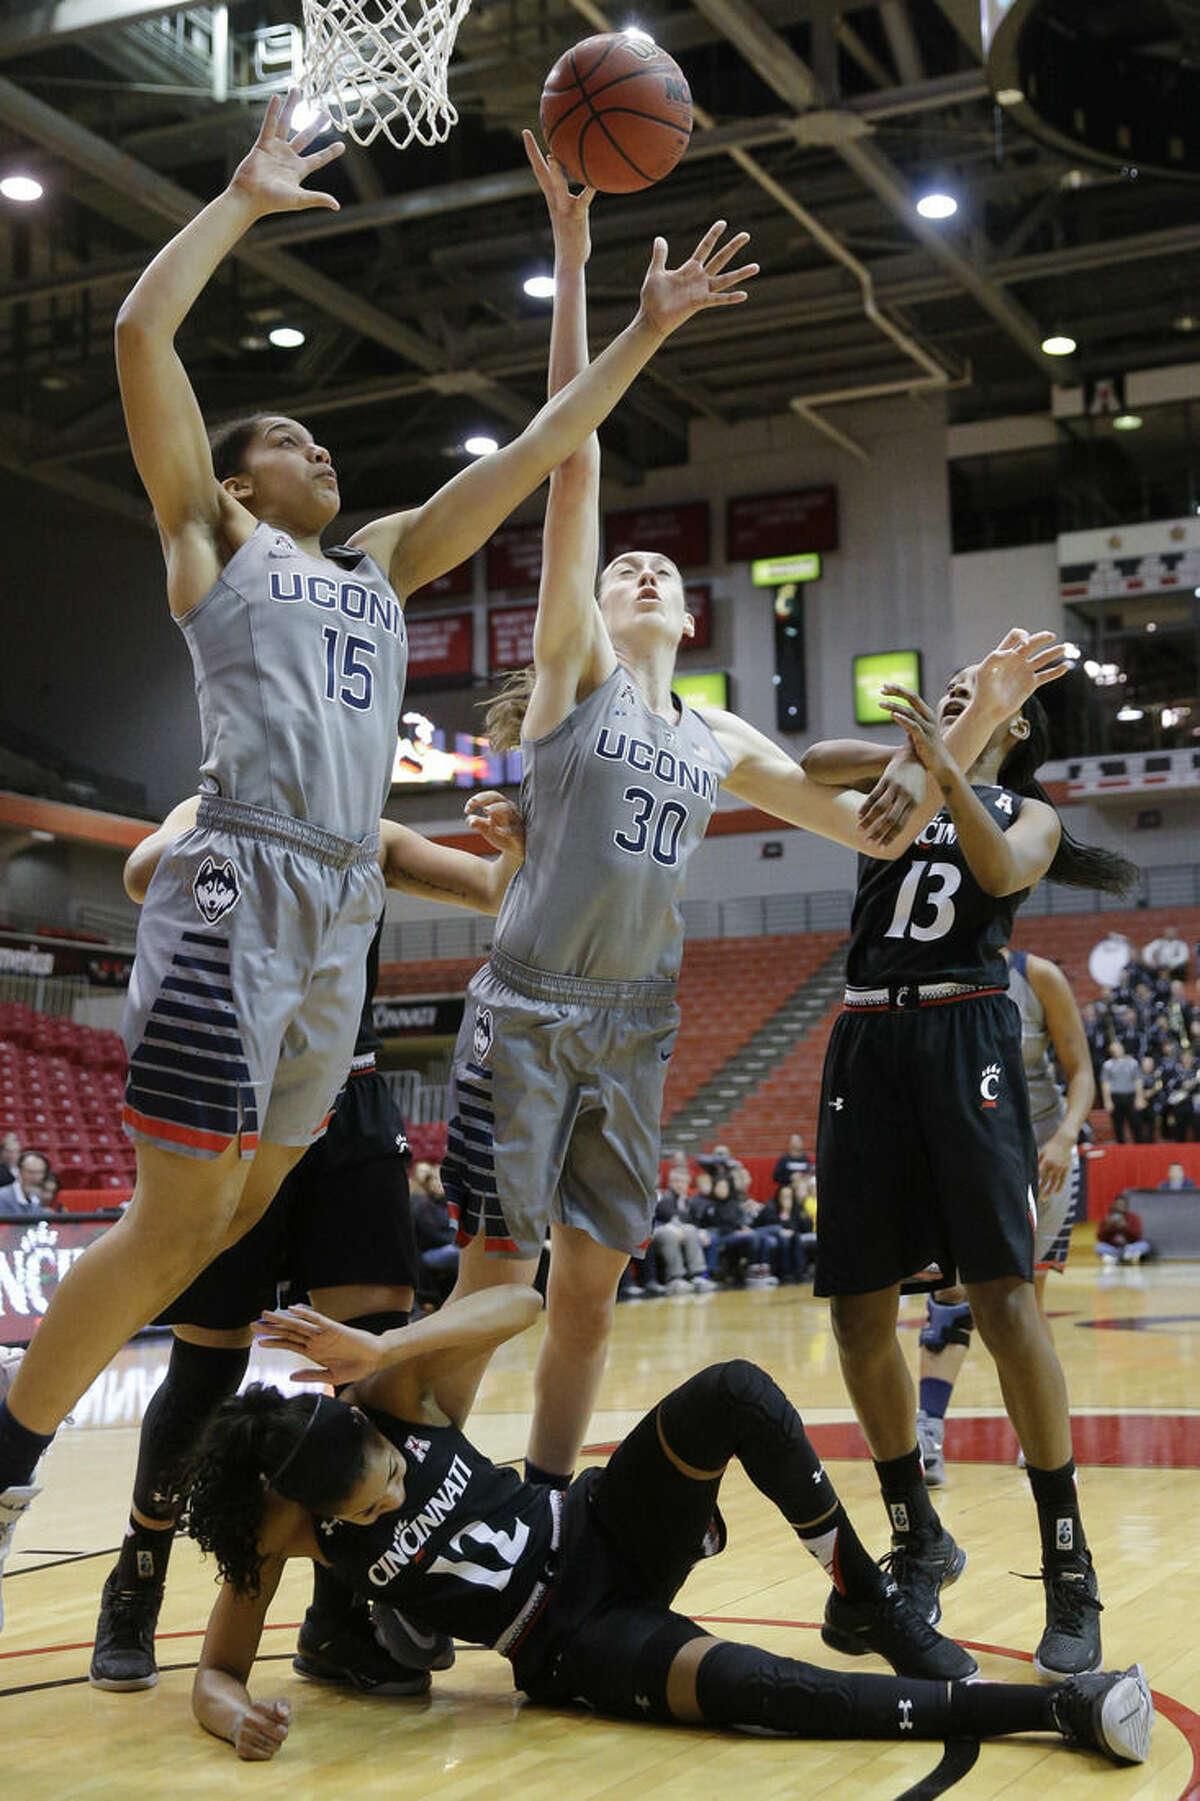 Connecticut's Breanna Stewart (30) and Gabby Williams (15) reach for a rebound over Cincinnati's Alyesha Lovett (12) during the first half of an NCAA college basketball game, Wednesday, Dec. 30, 2015, in Cincinnati. (AP Photo/John Minchillo)